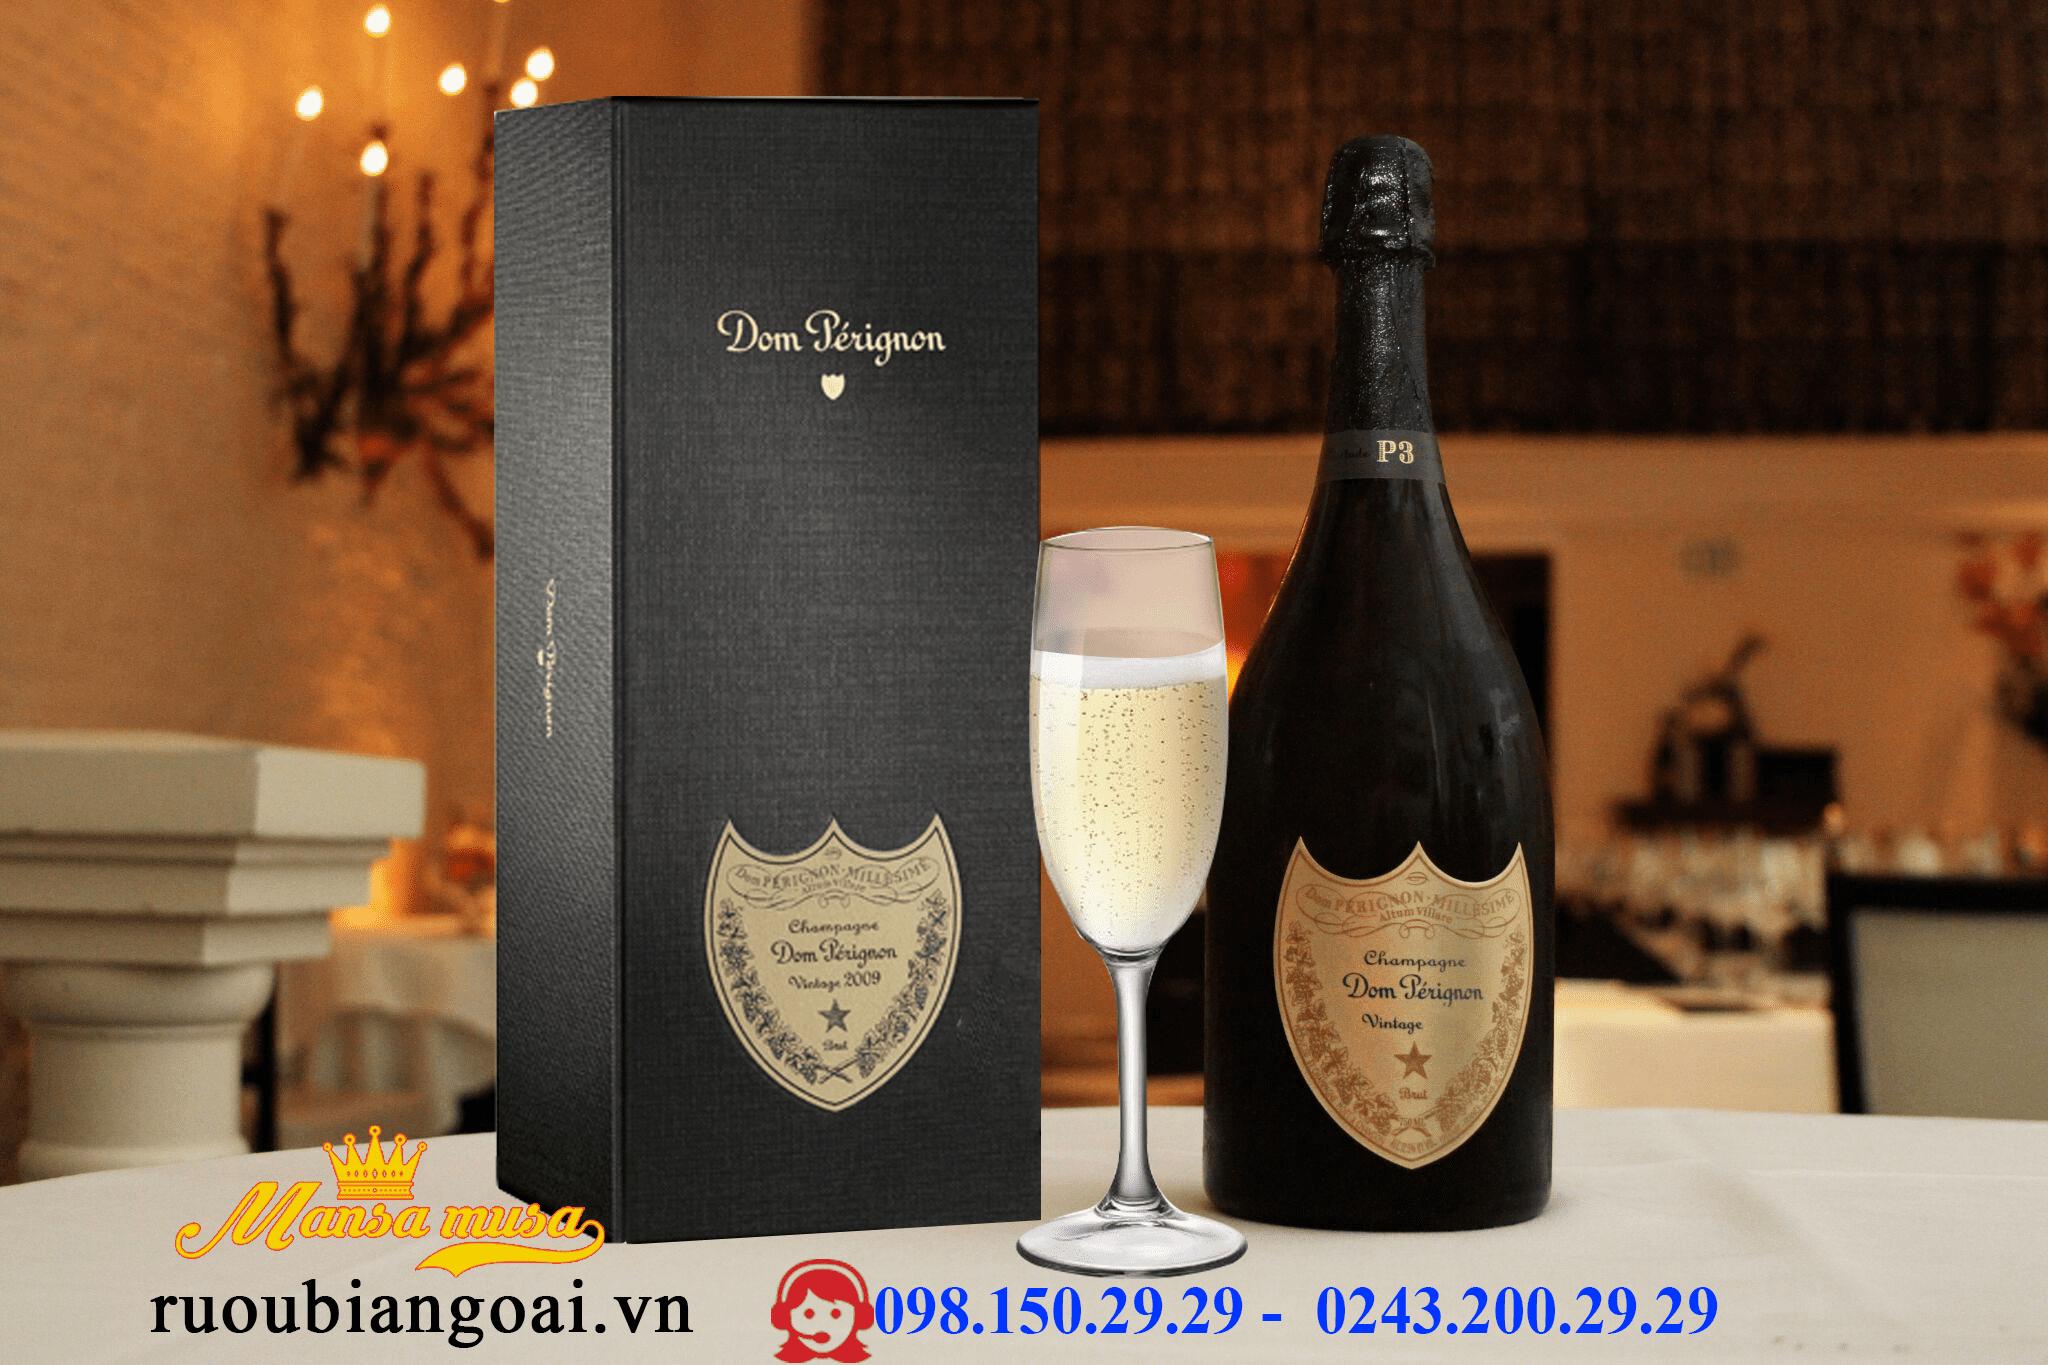 Rượu Champagne Dom Pérignon 2009